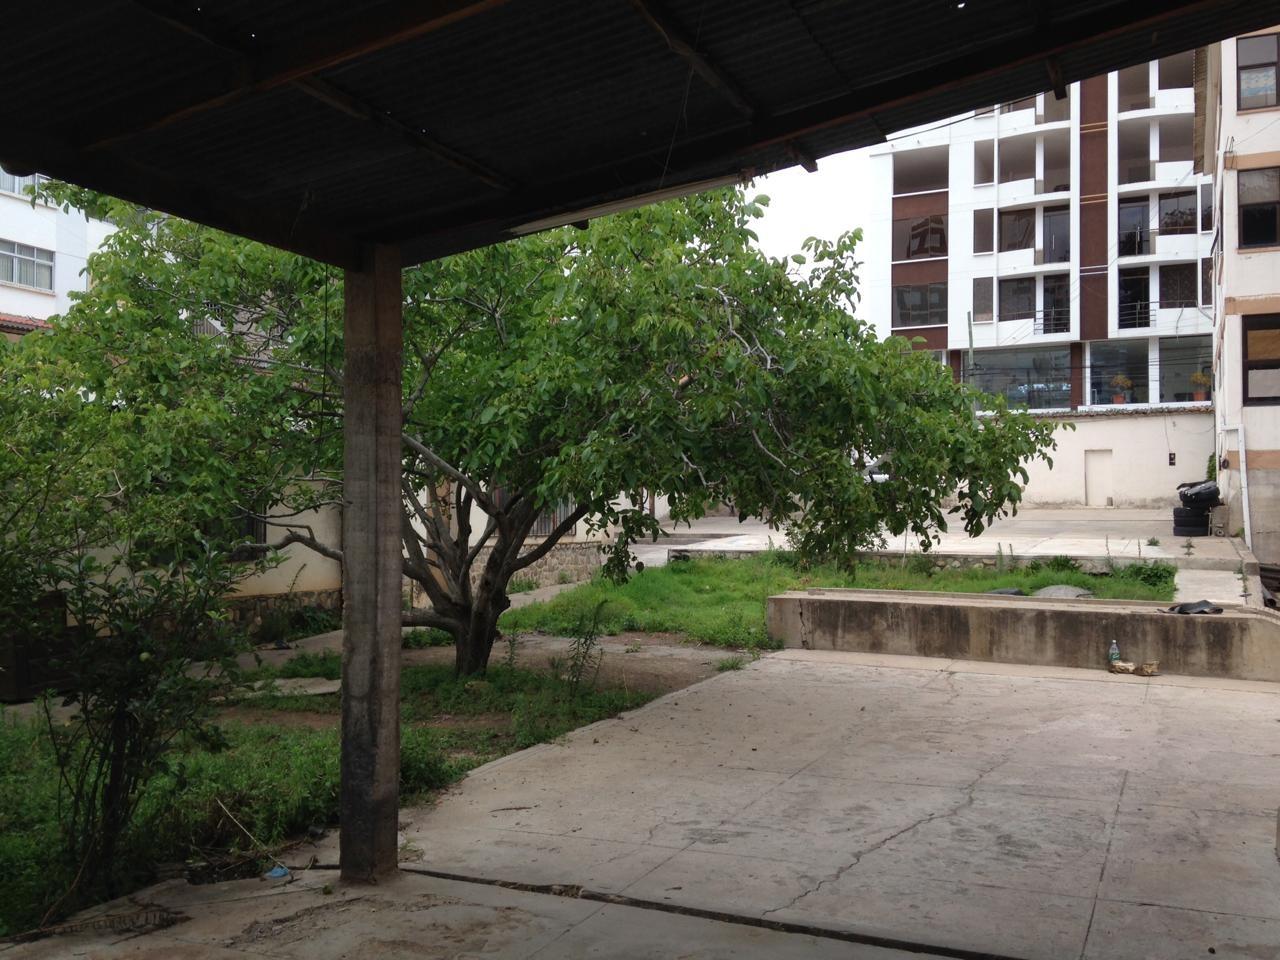 Terreno en Venta BARRIO PETROLERO, AV. LAS AMERICAS, CALLE MÉXICO. Foto 6